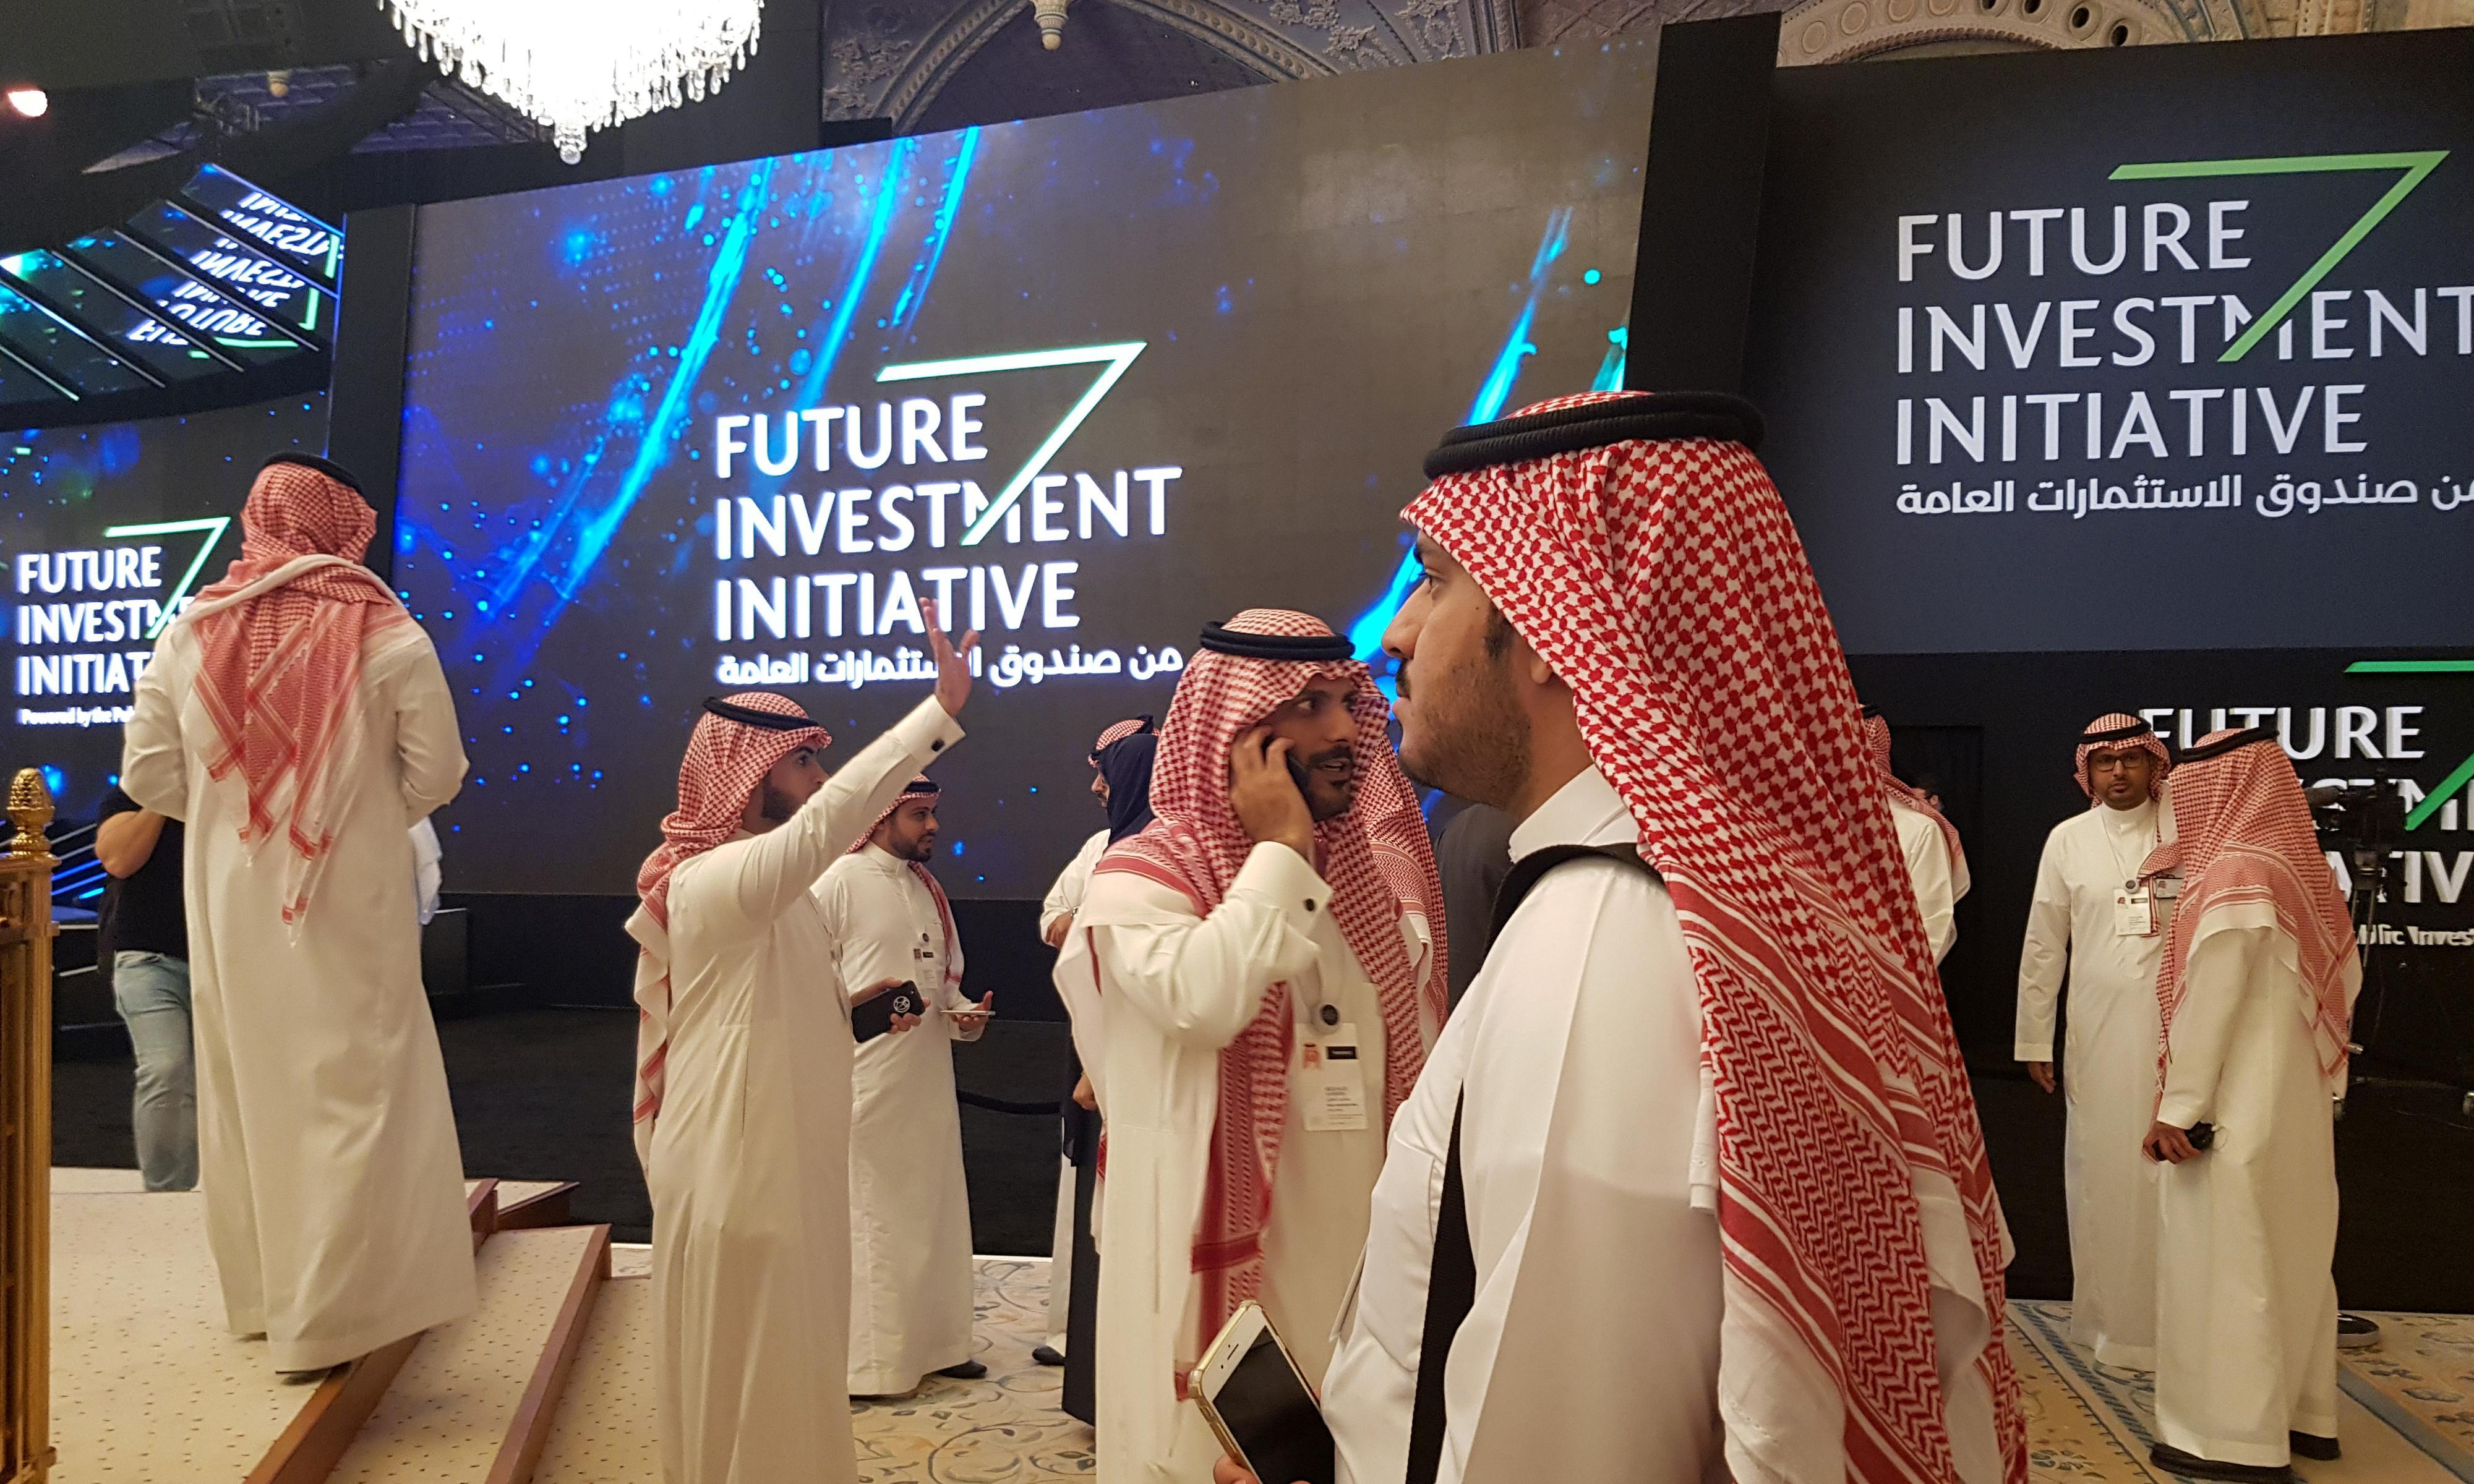 How real is Saudi Arabia's interest in renewable energy?